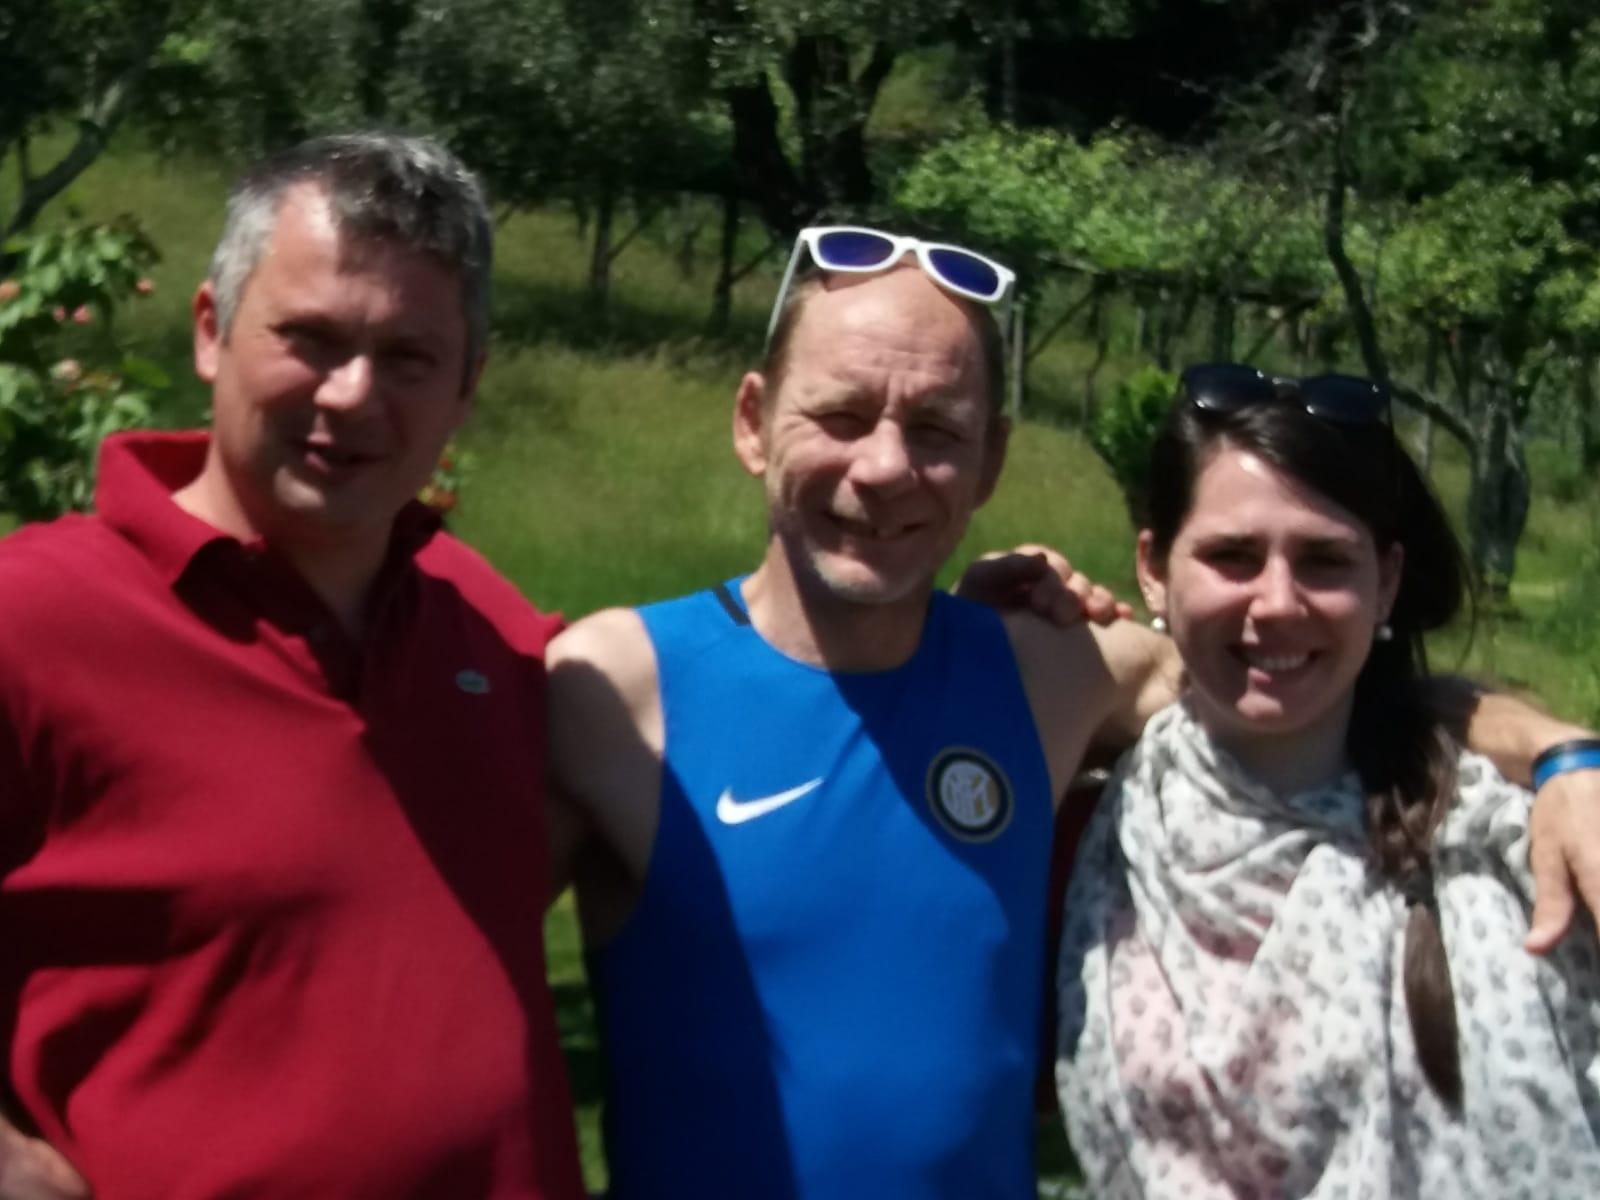 Andrea Danielli (middle) with his two rescuers, Andrea Vercesi (left) and Silvia Vercei (right).